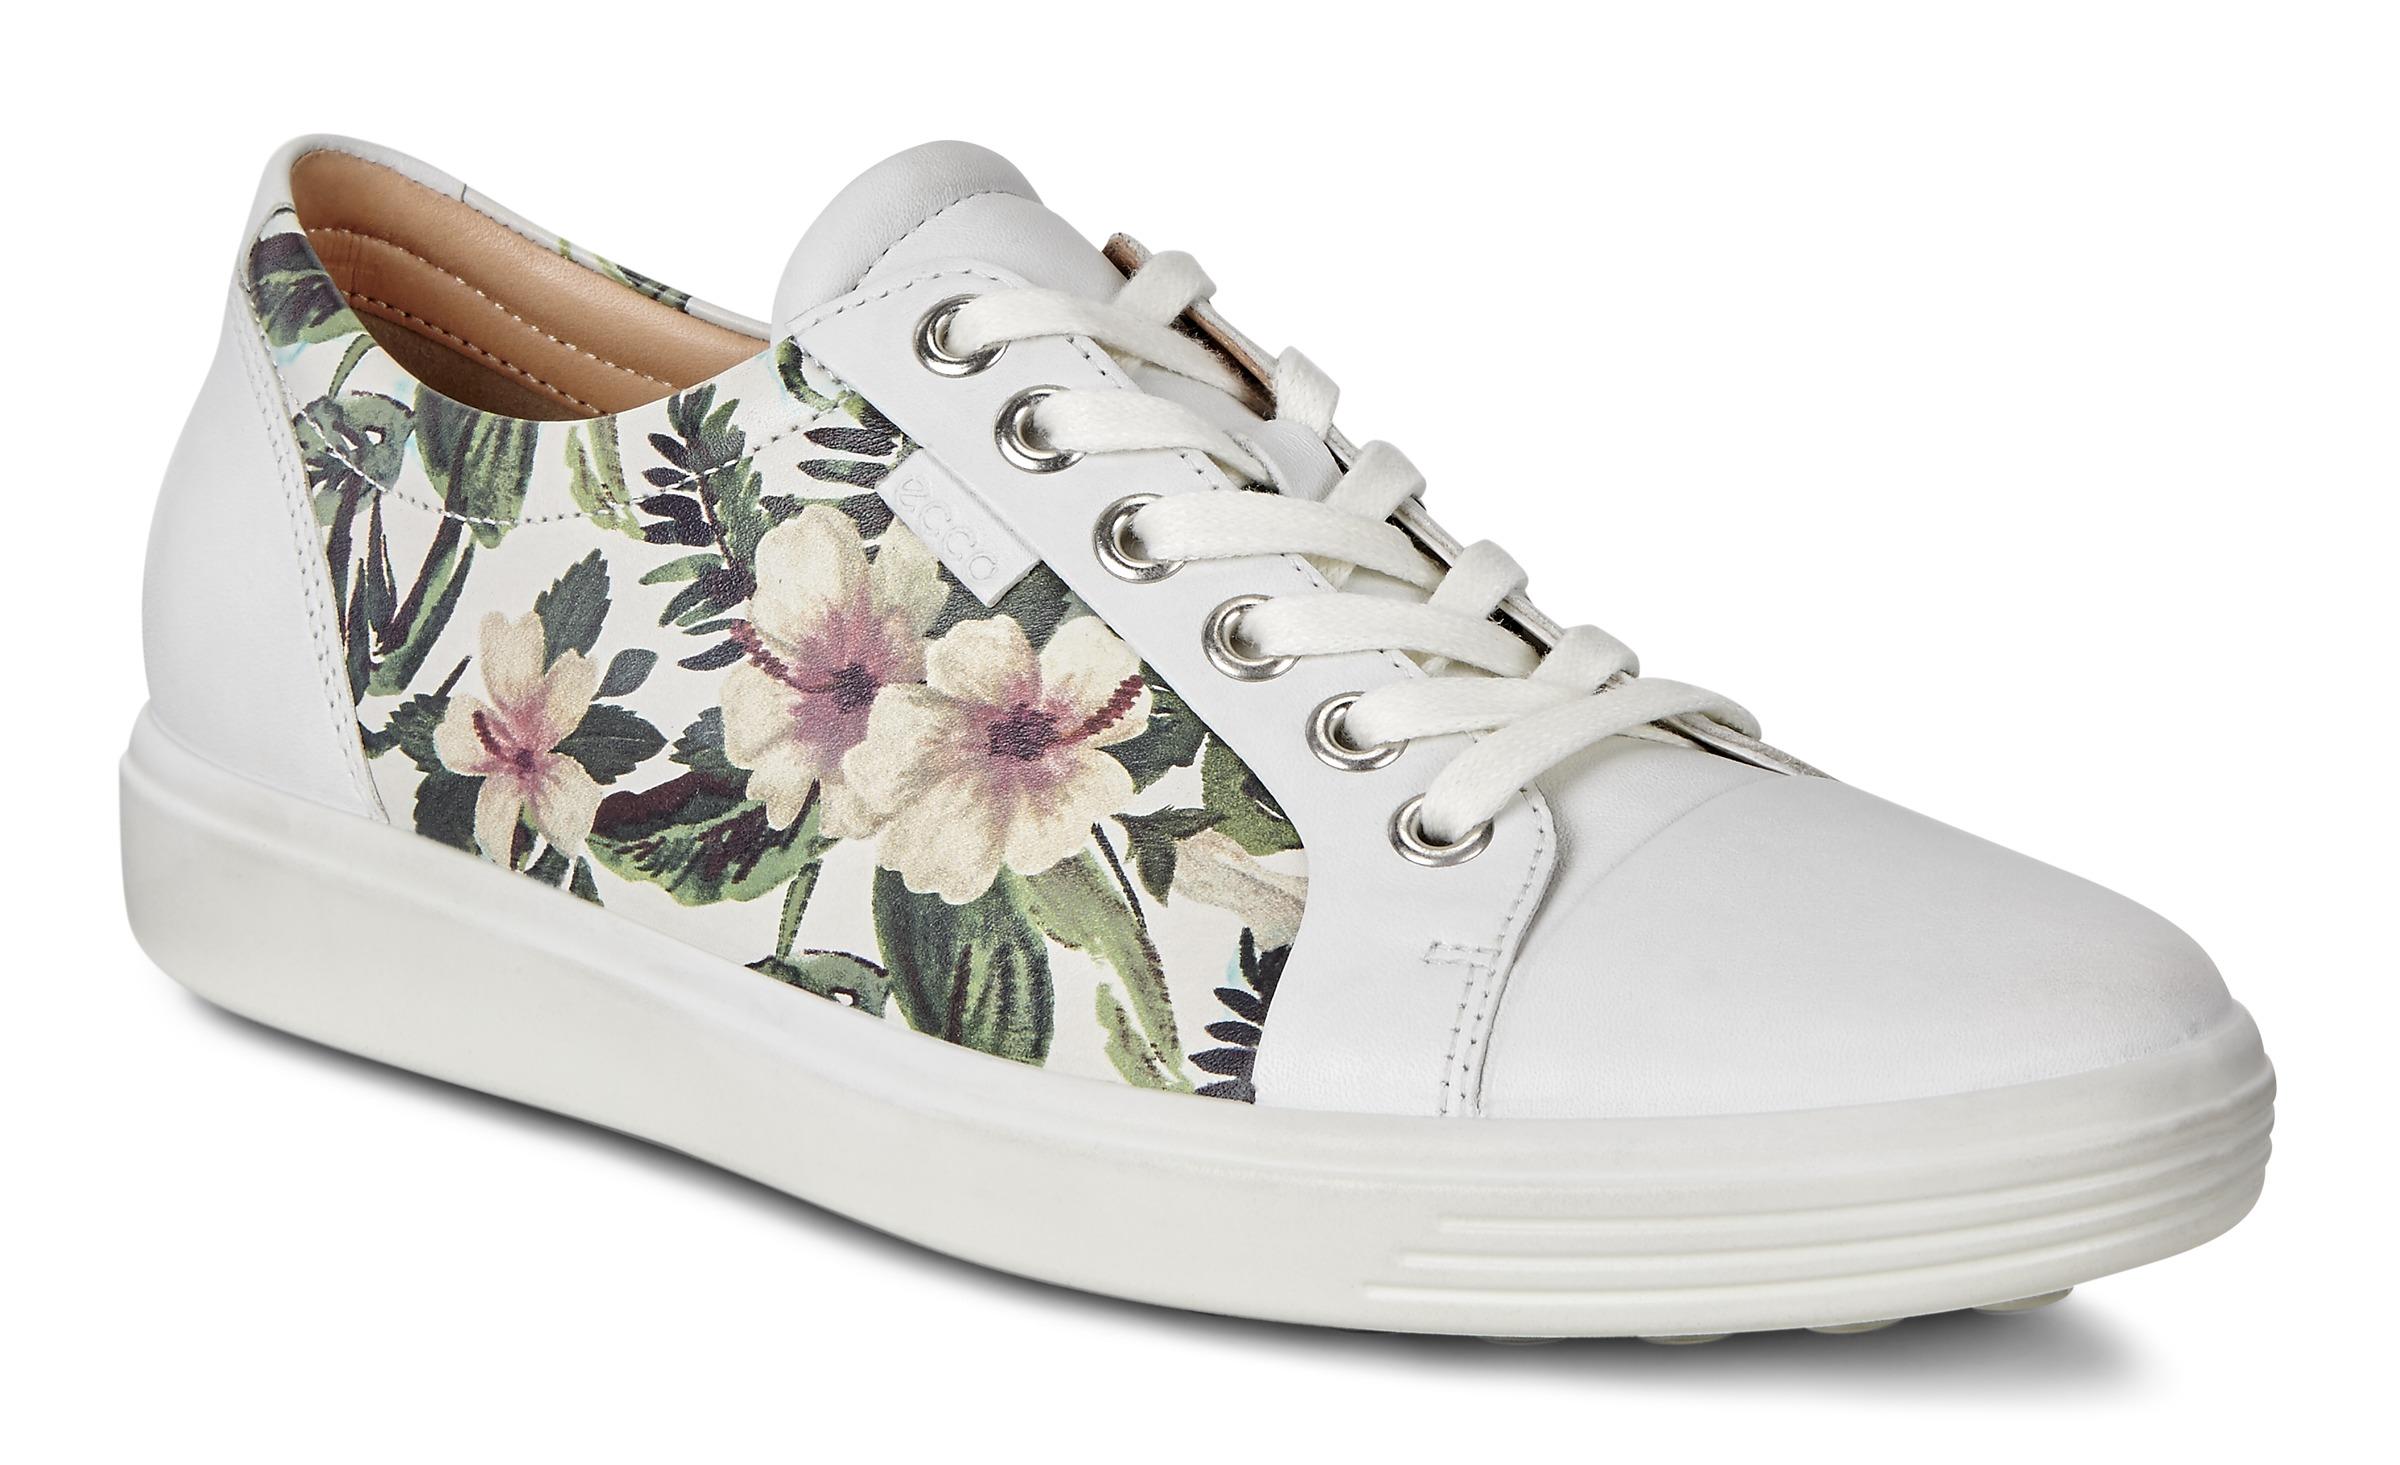 Vinn sko og veske fra Ecco!   Tara.no